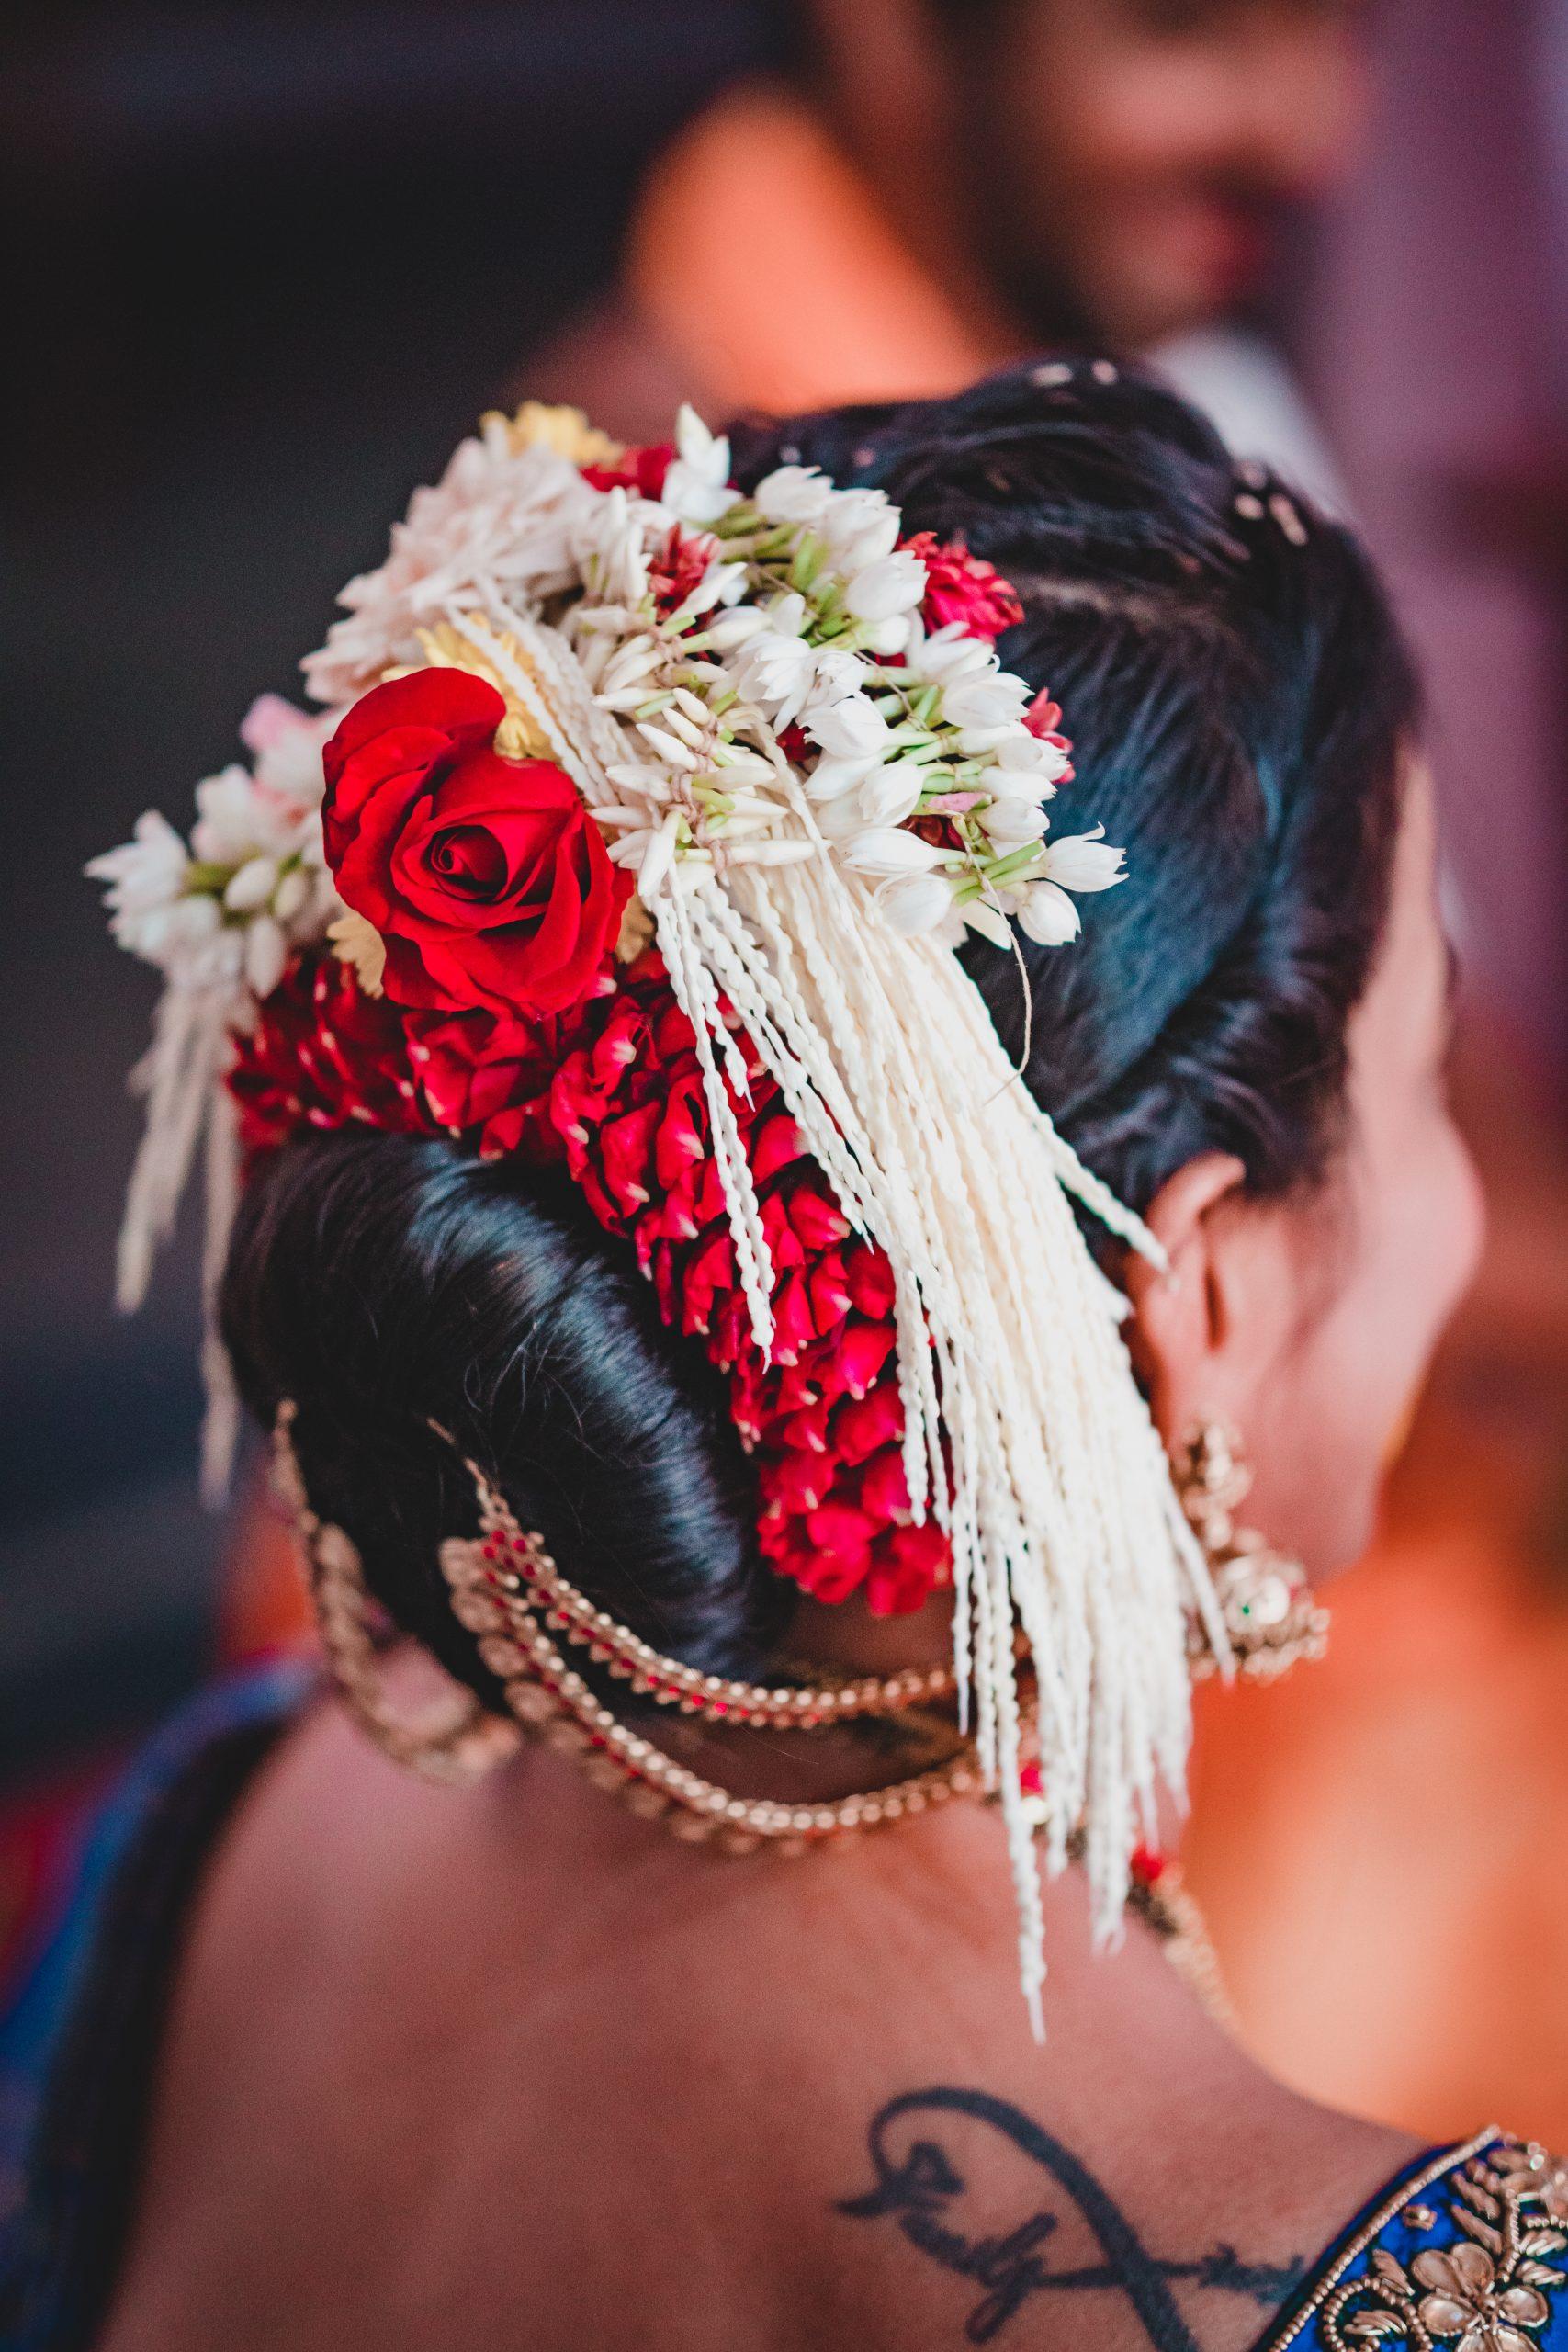 Flower on head of a girl